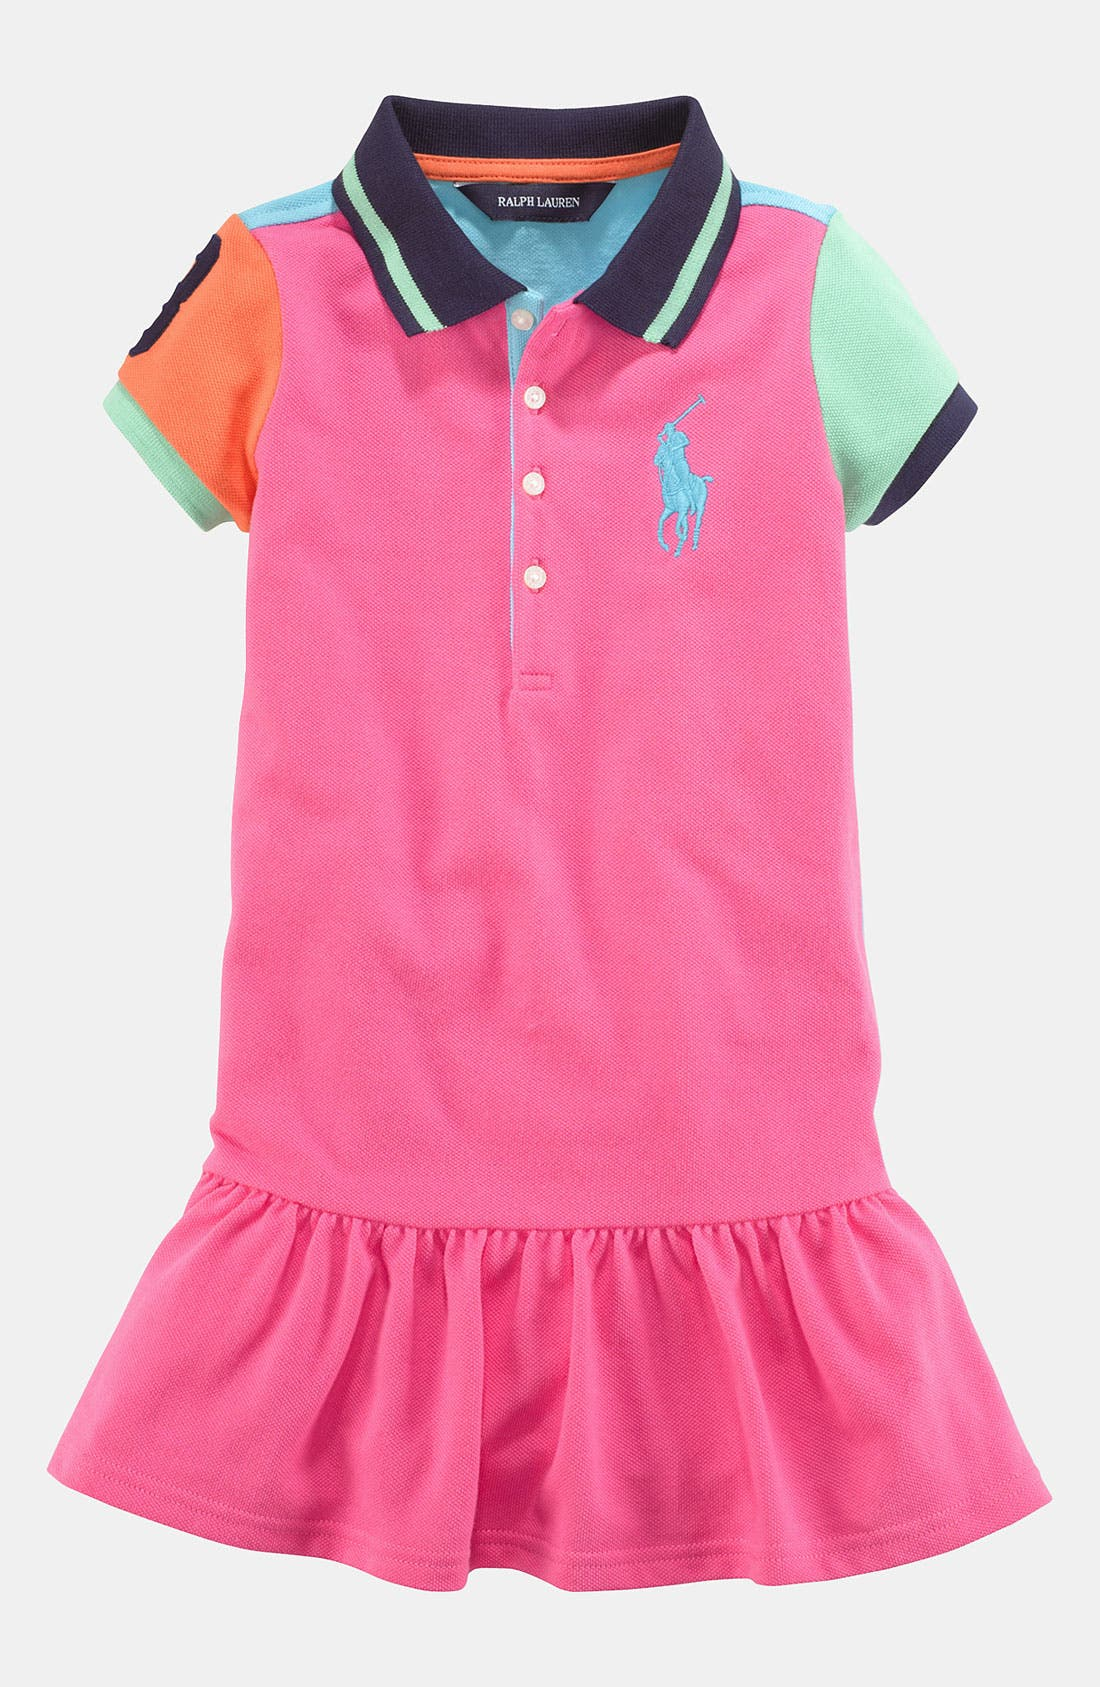 Alternate Image 1 Selected - Ralph Lauren Colorblock Polo Dress (Toddler)